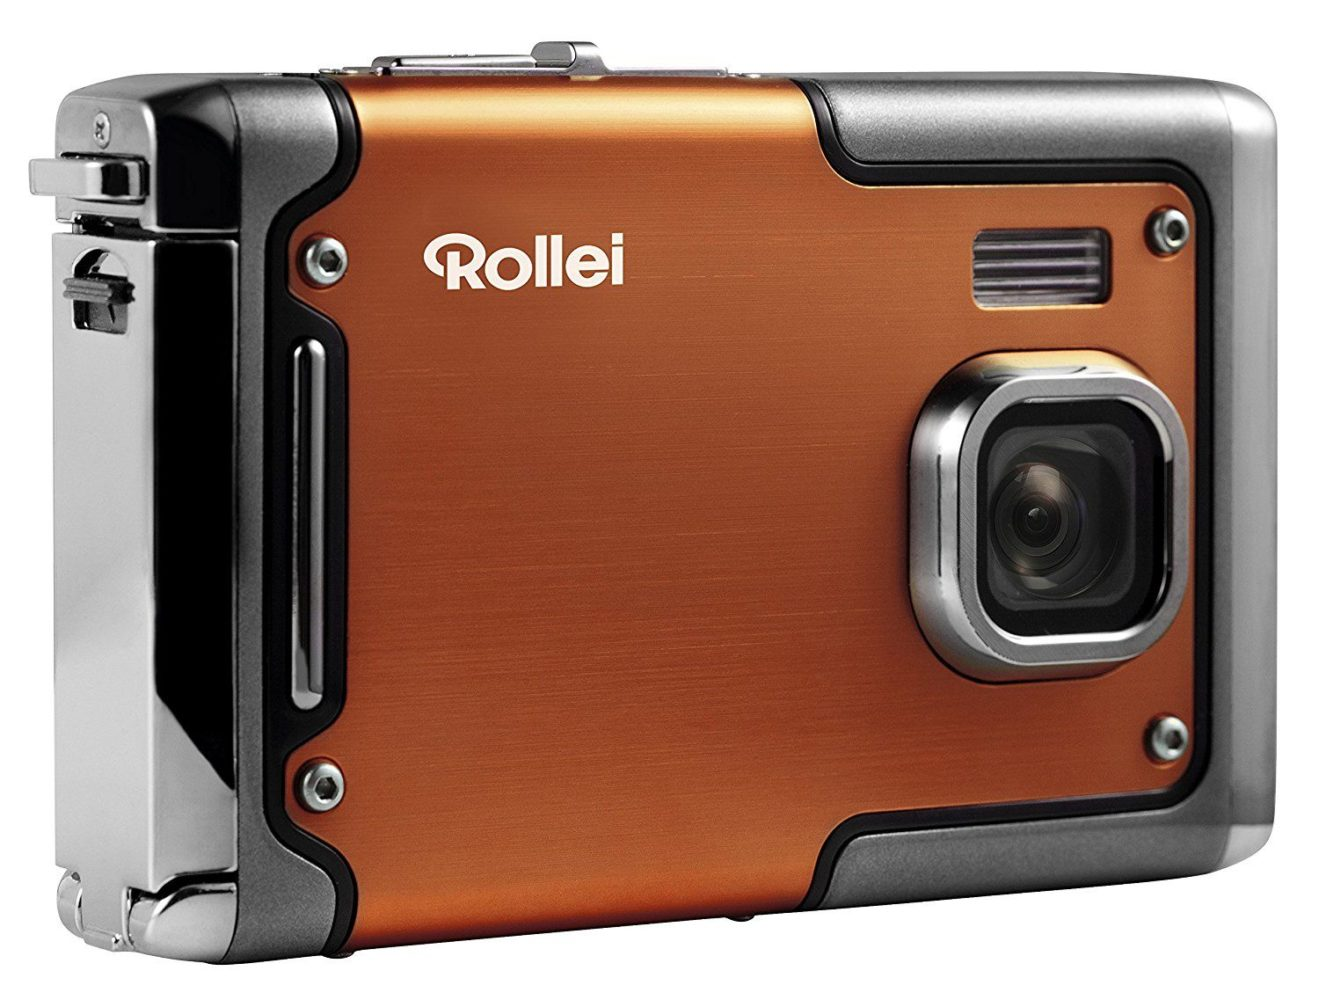 Rollei, 85, Sportsline, Kamera, Fotokamera, Produkttest, Review, Erfahrungsbericht